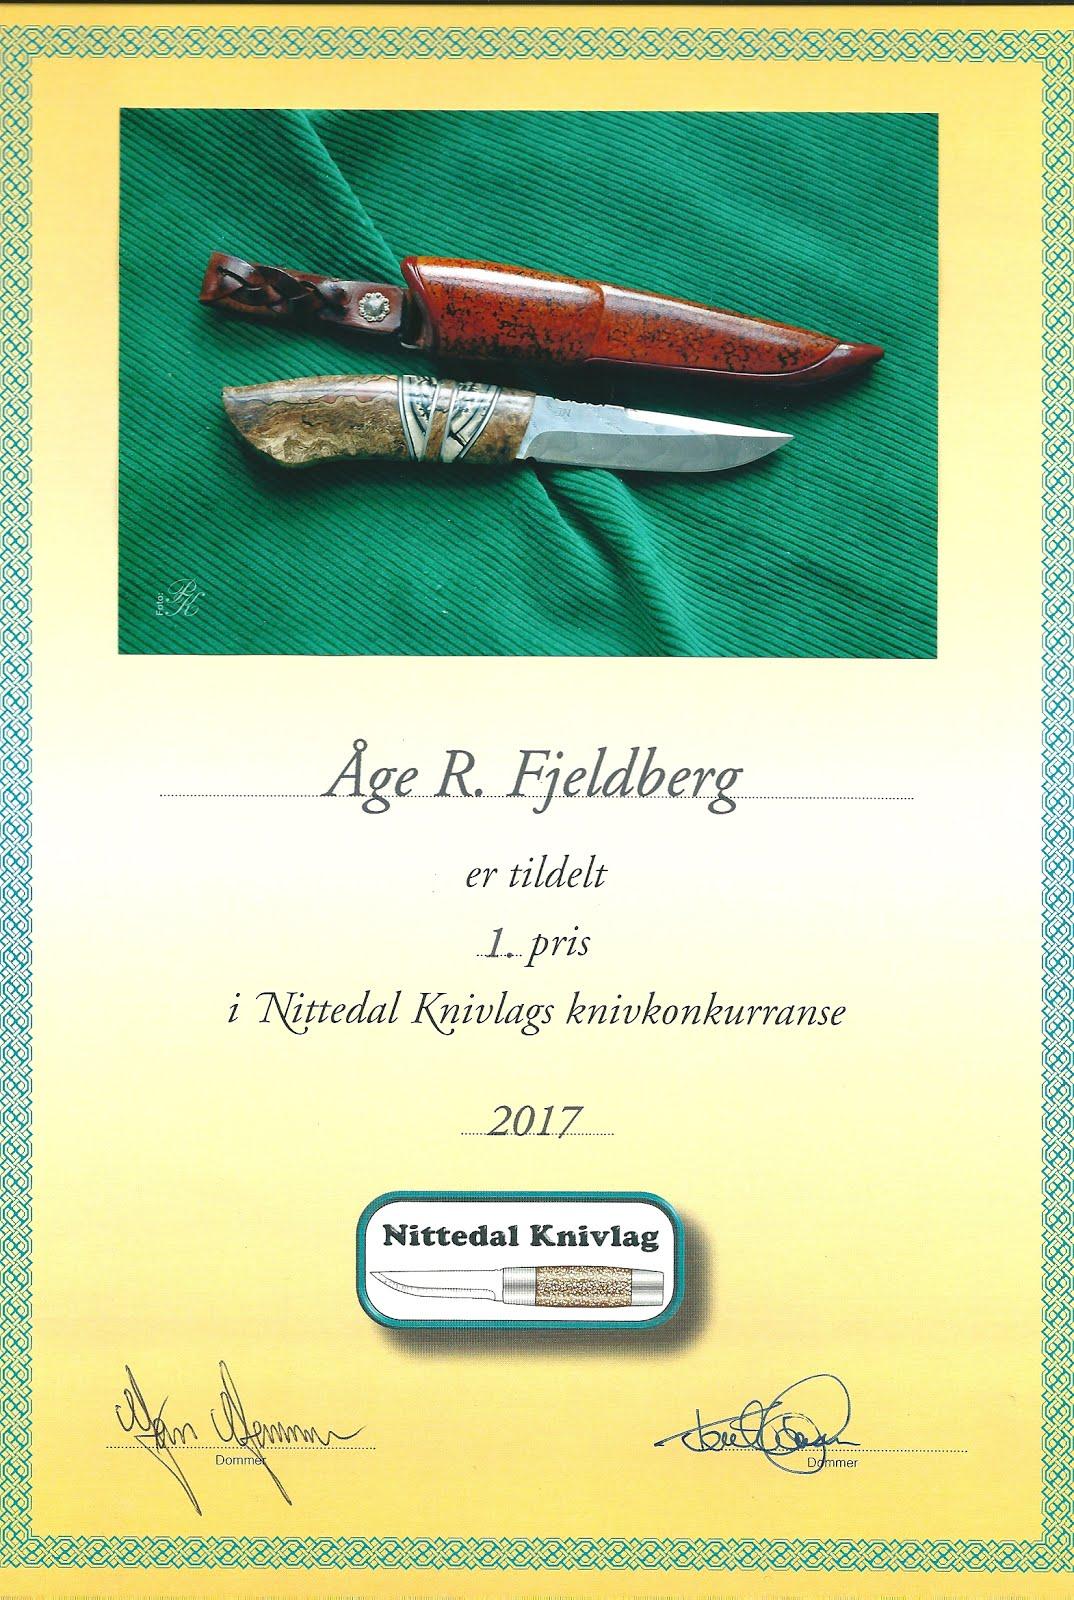 Nittedal Knivlag 2017